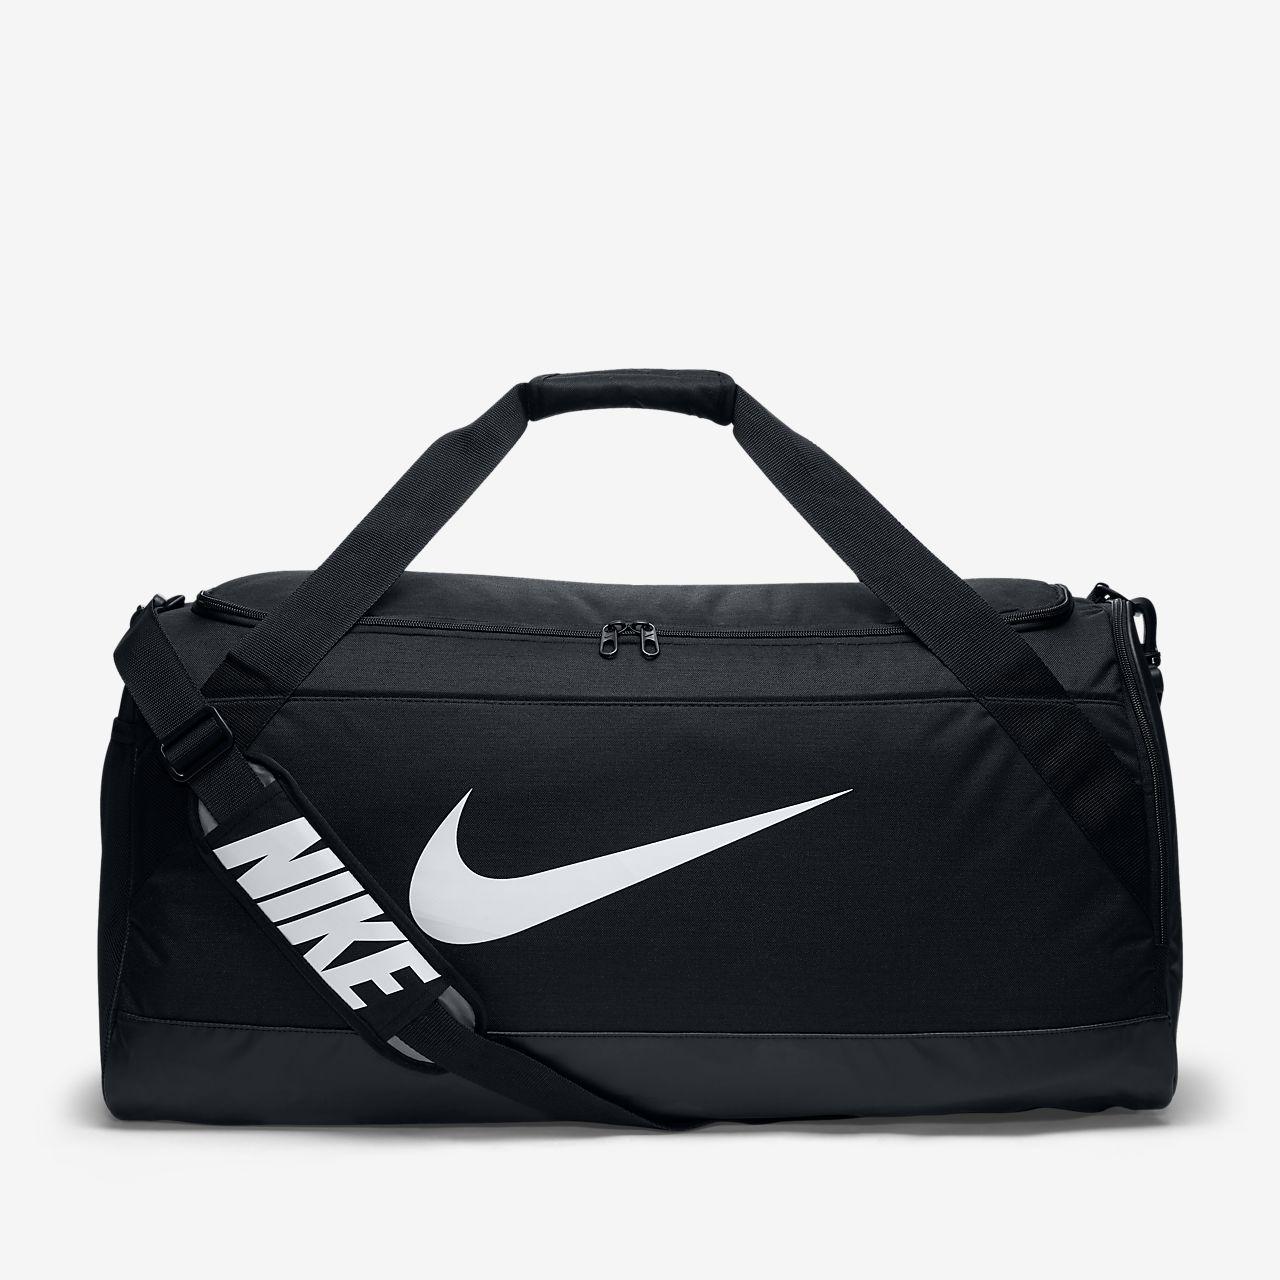 5563ee6c15 Borsone da training Nike Brasilia (grande). Nike.com IT